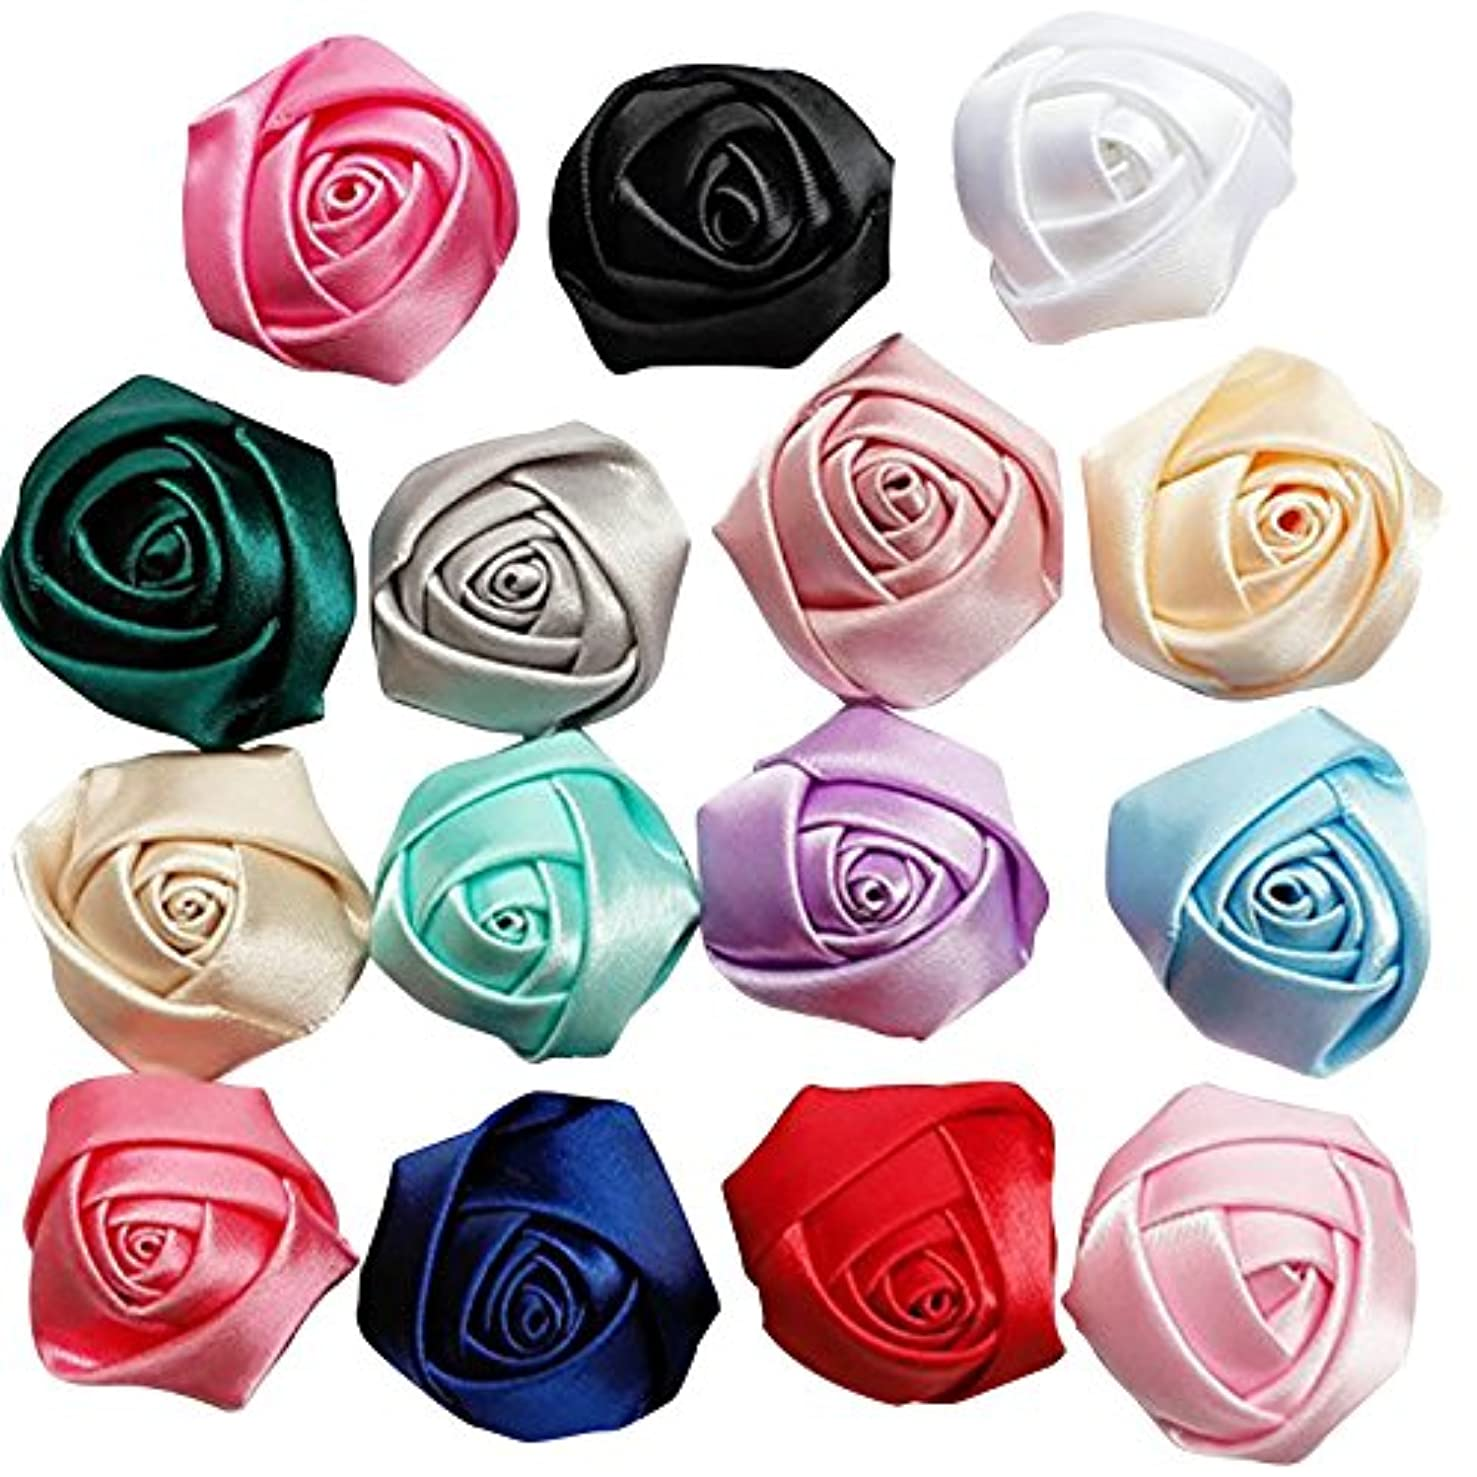 Chenkou Craft 30pcs Assorted Satin Ribbon Rose Flowers Bows Craft Mix Lots (Ribbon Rose)